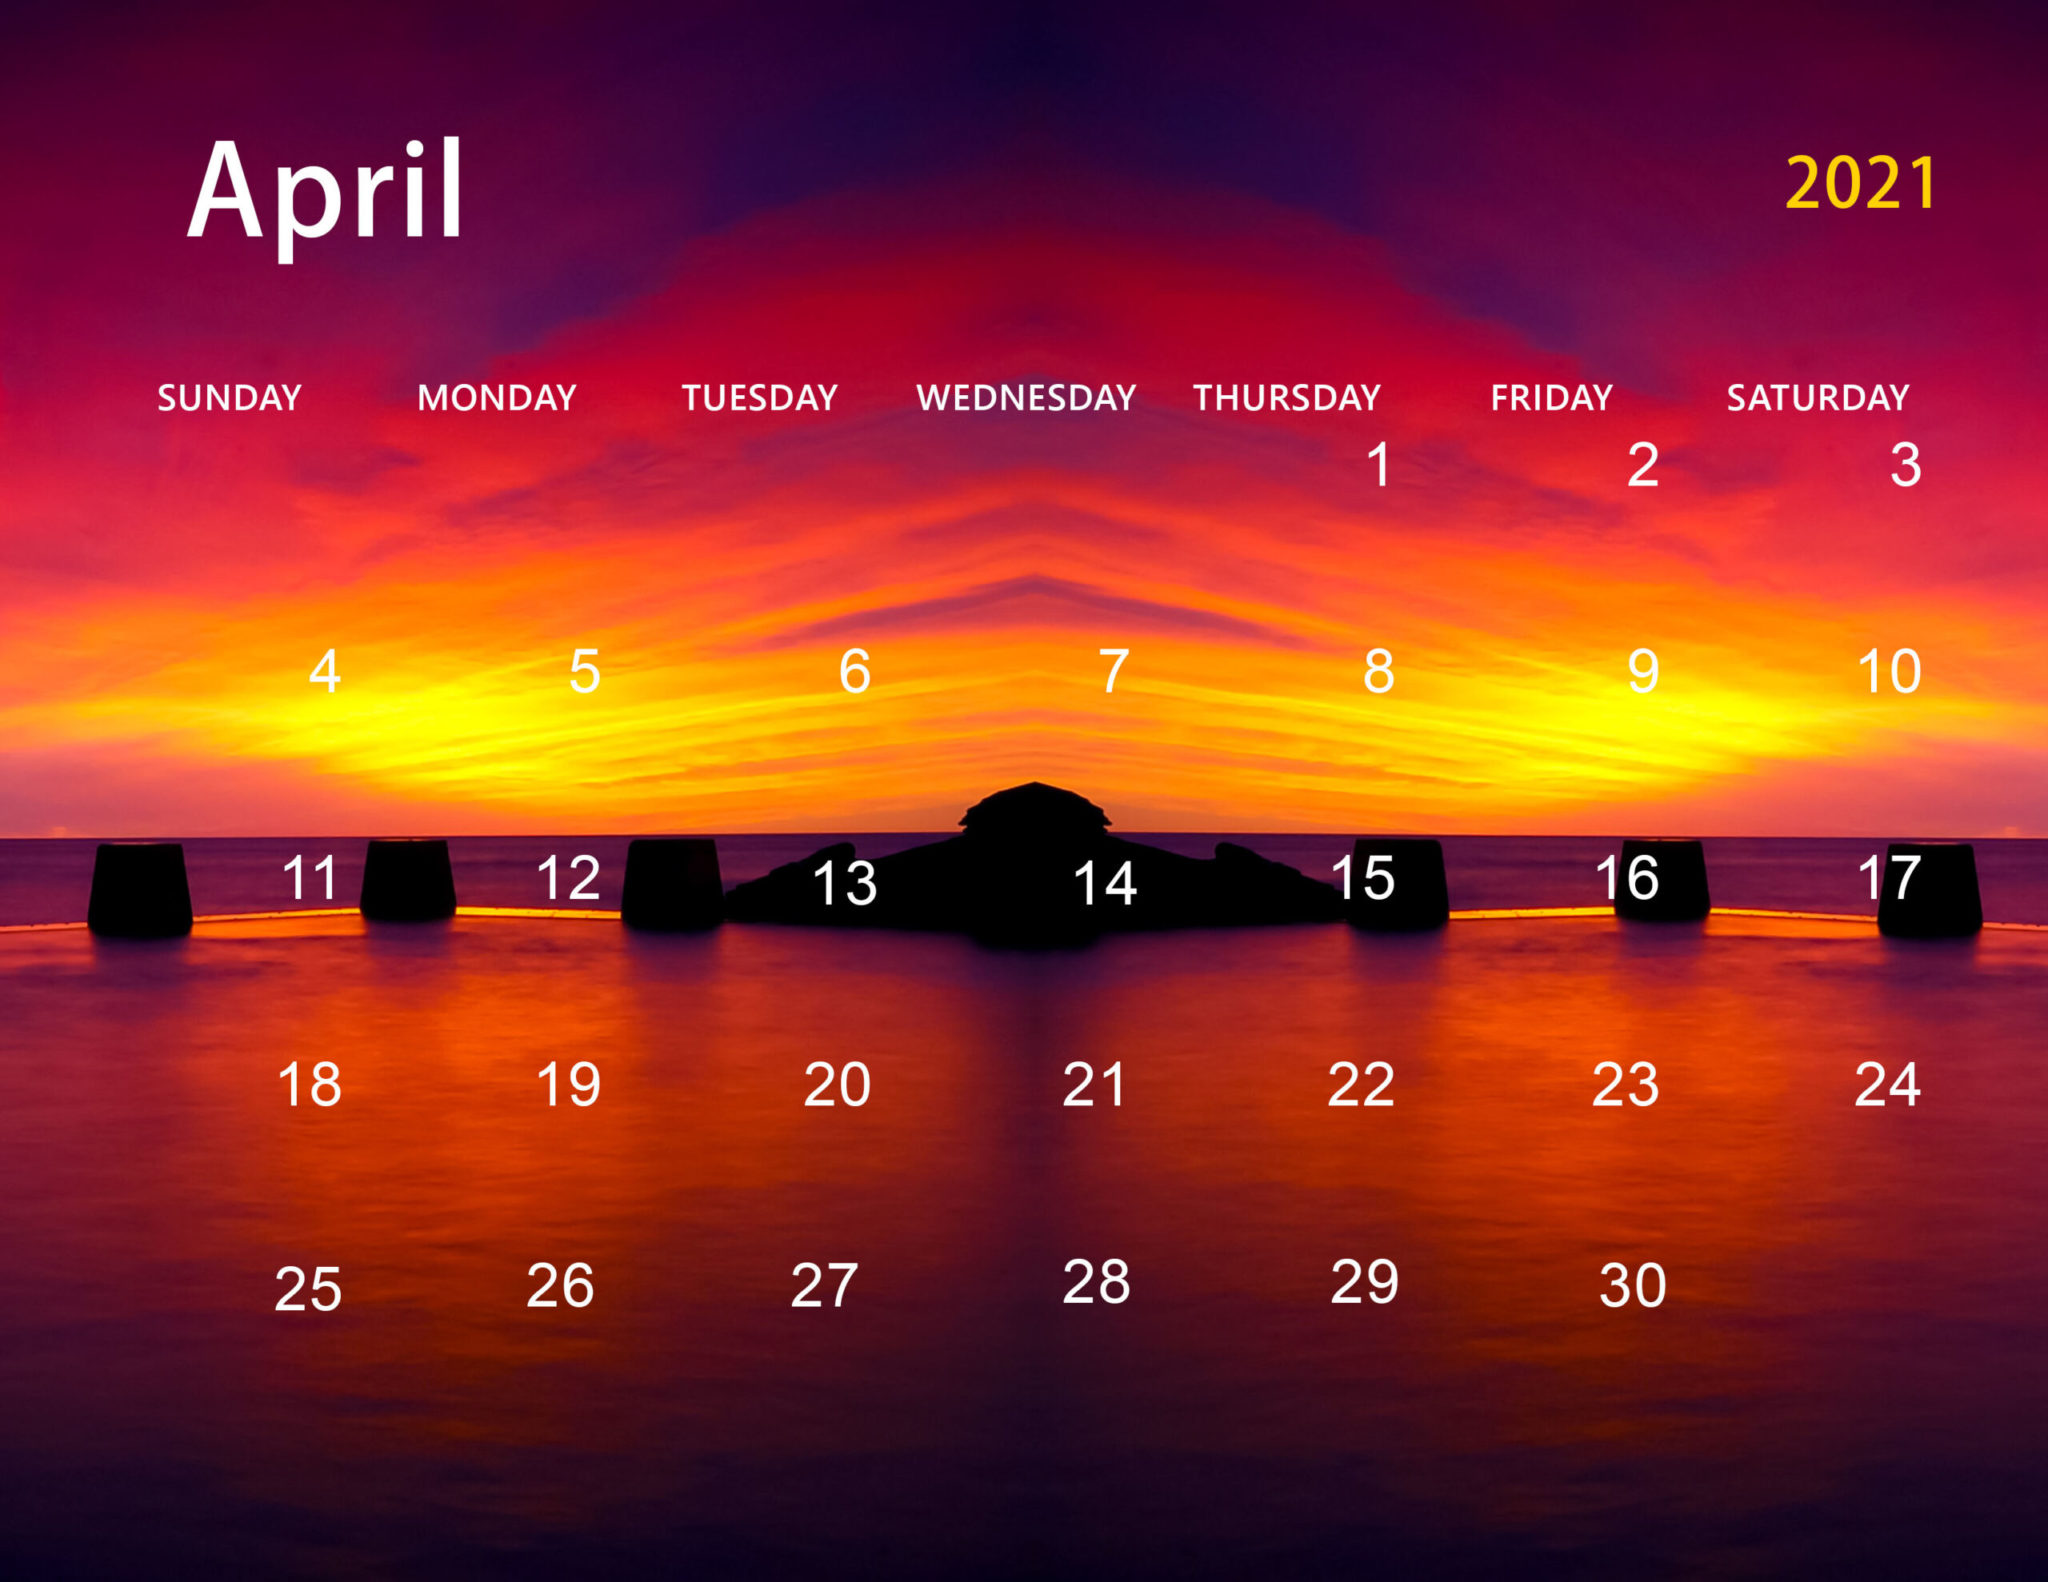 Cute April 2021 Calendar Desktop Wallpaper